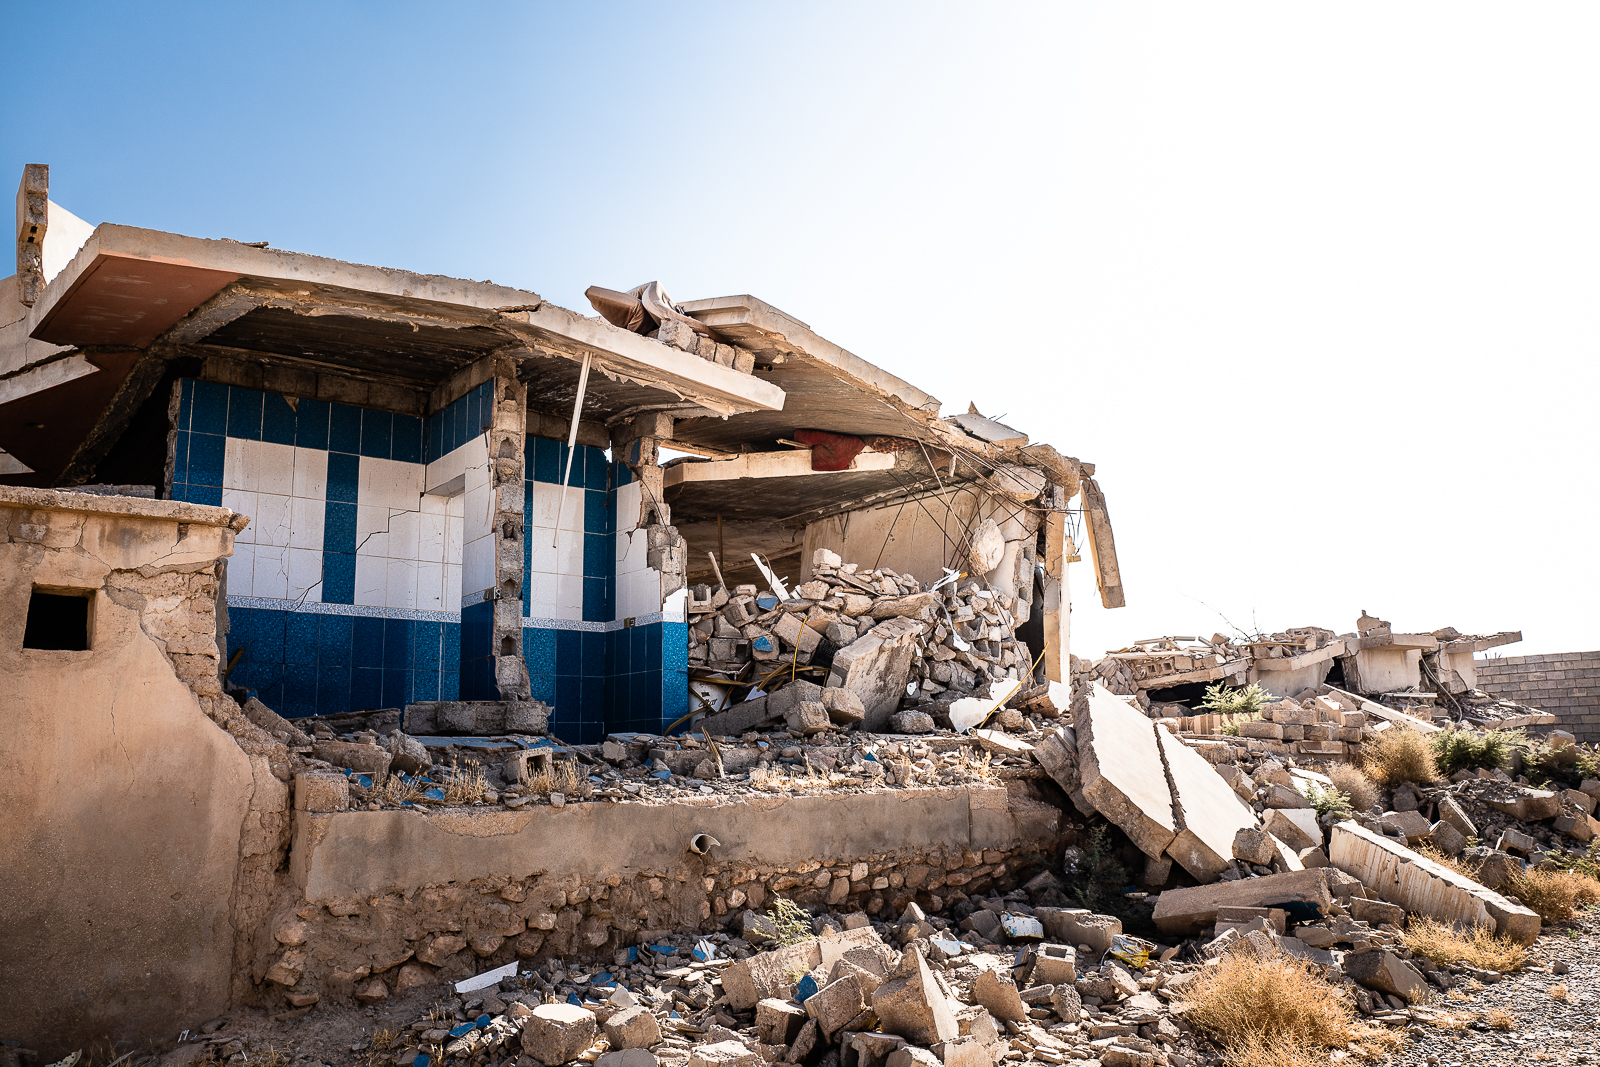 The destroyed villages under the Sinjar mount were the Yazidi people lived